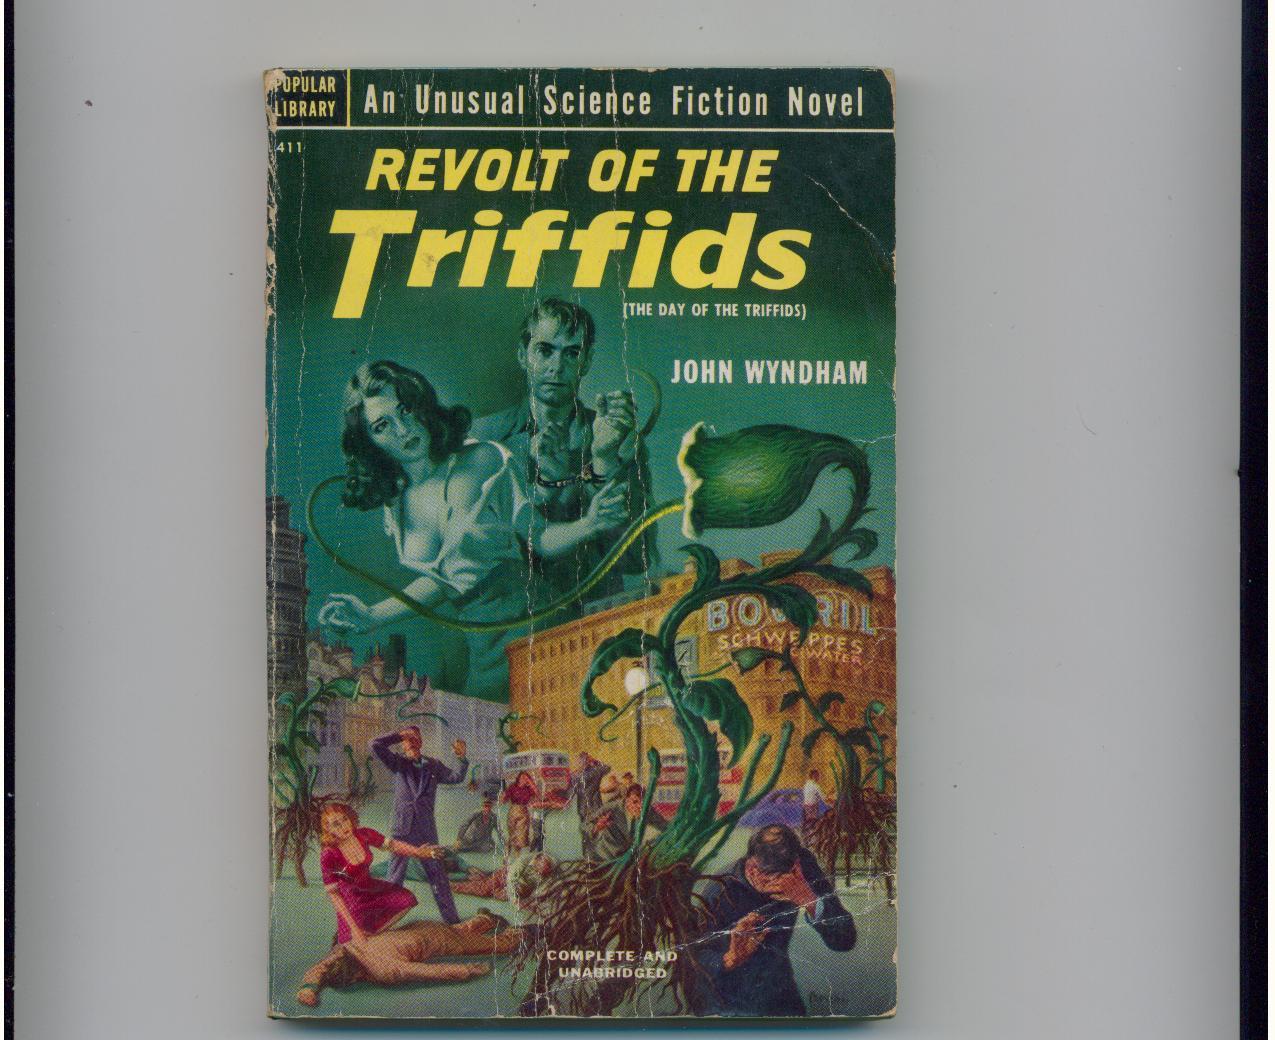 John Wyndham  REVOLT OF THE TRIFFIDS  1952  1st pb printing